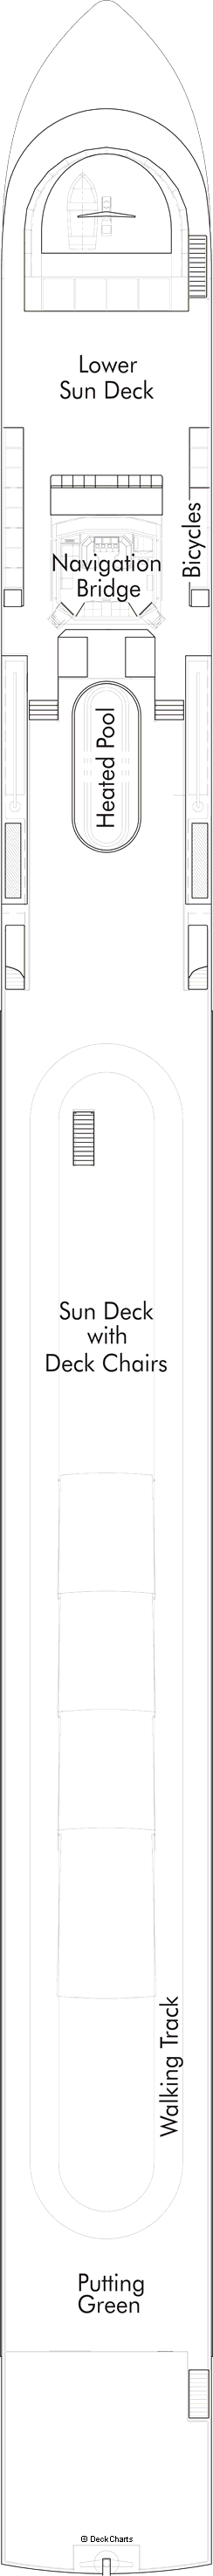 AmaBella: Sun Deck